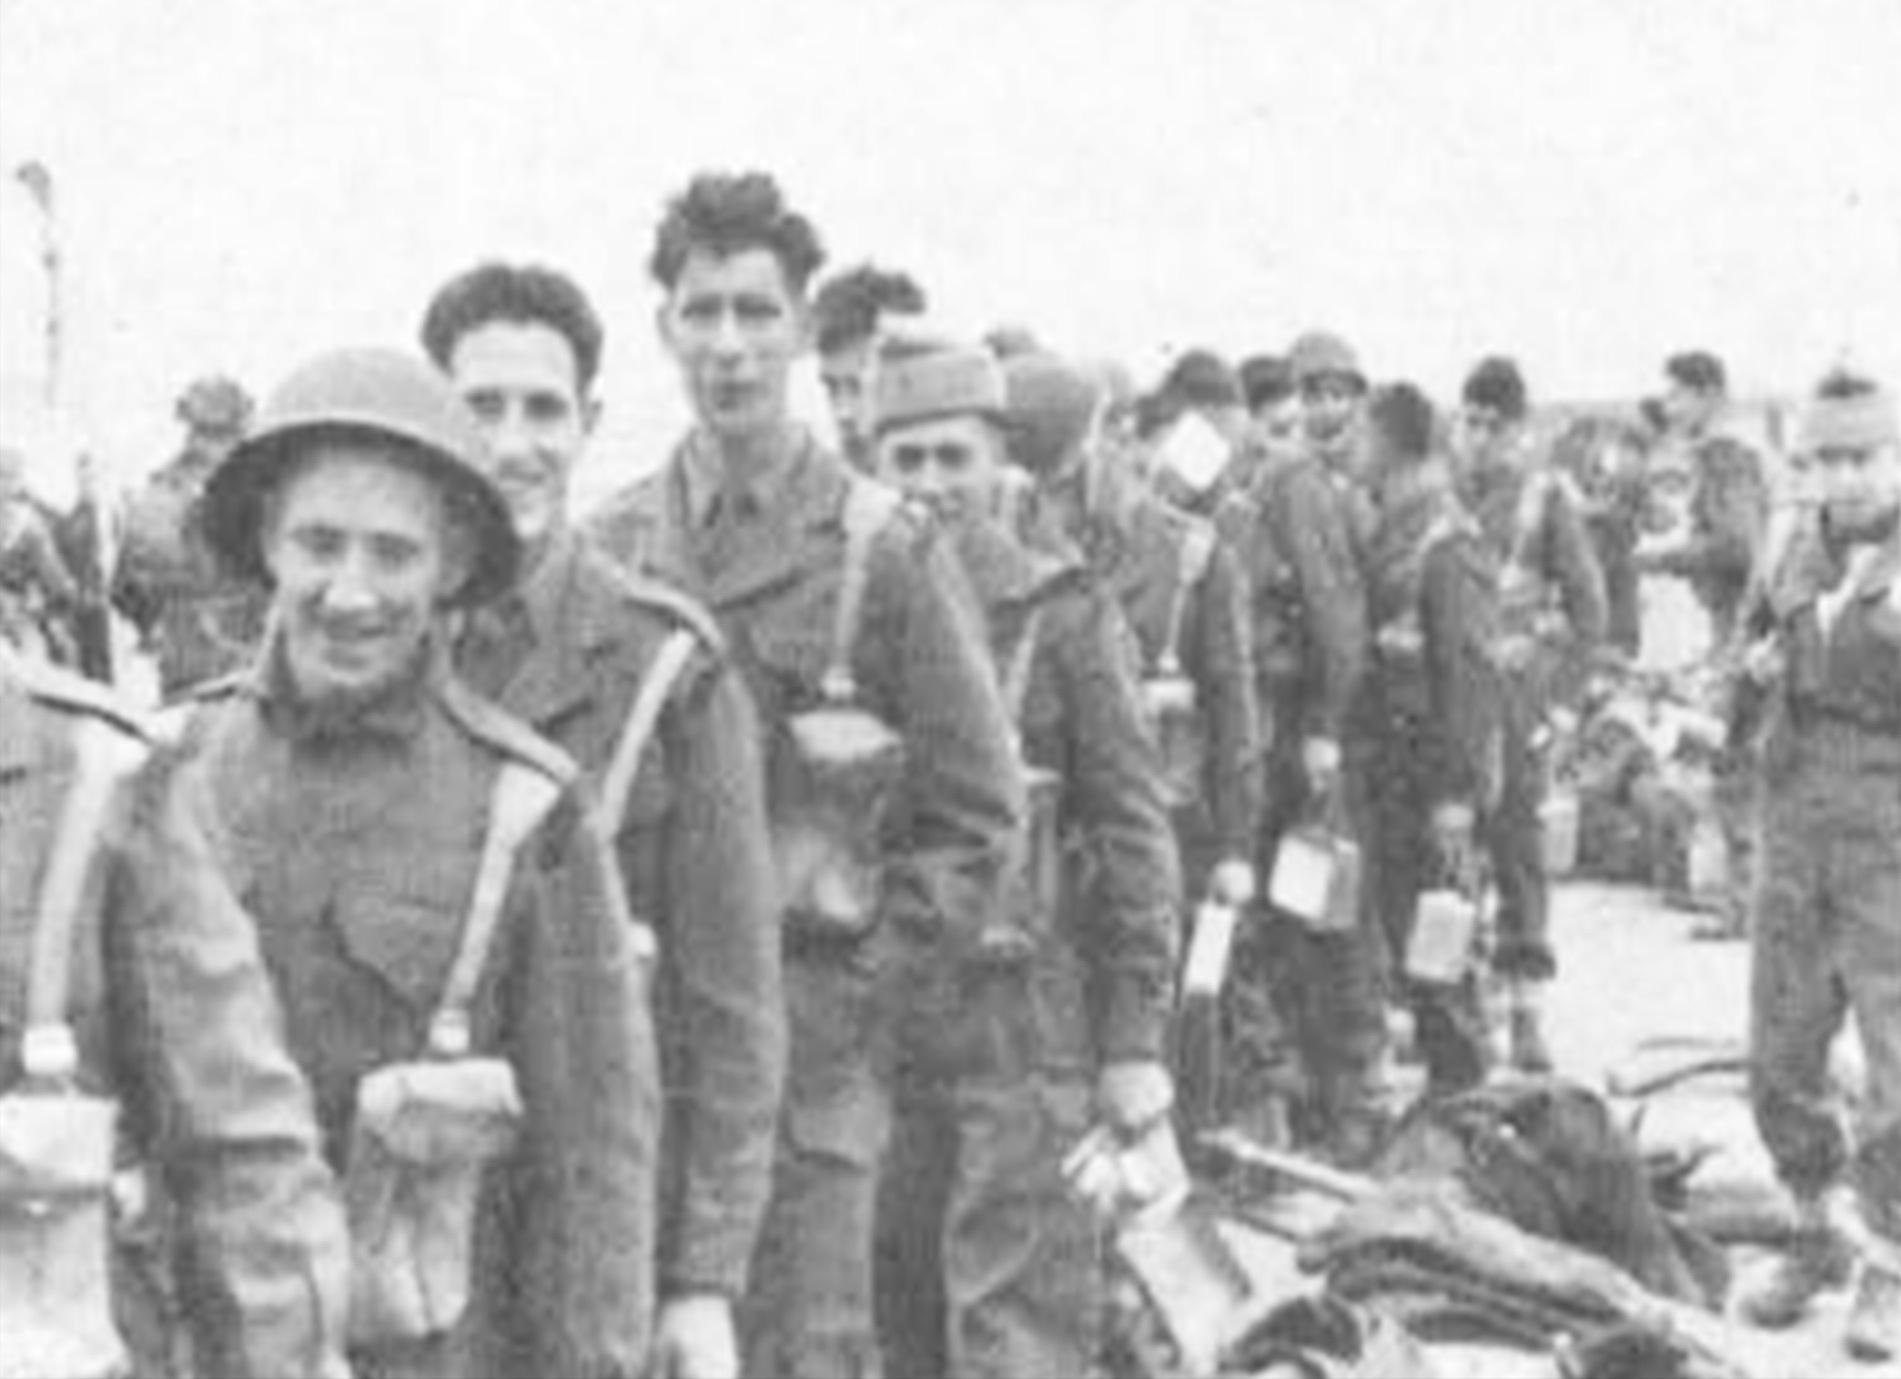 (From left) Gordon Highlanders Morrison, Warrender, Bolt, Hamilton and Oliphant whilst filming for 1958 film Dunkirk. Copyright of The Gordon Highlanders Museum.